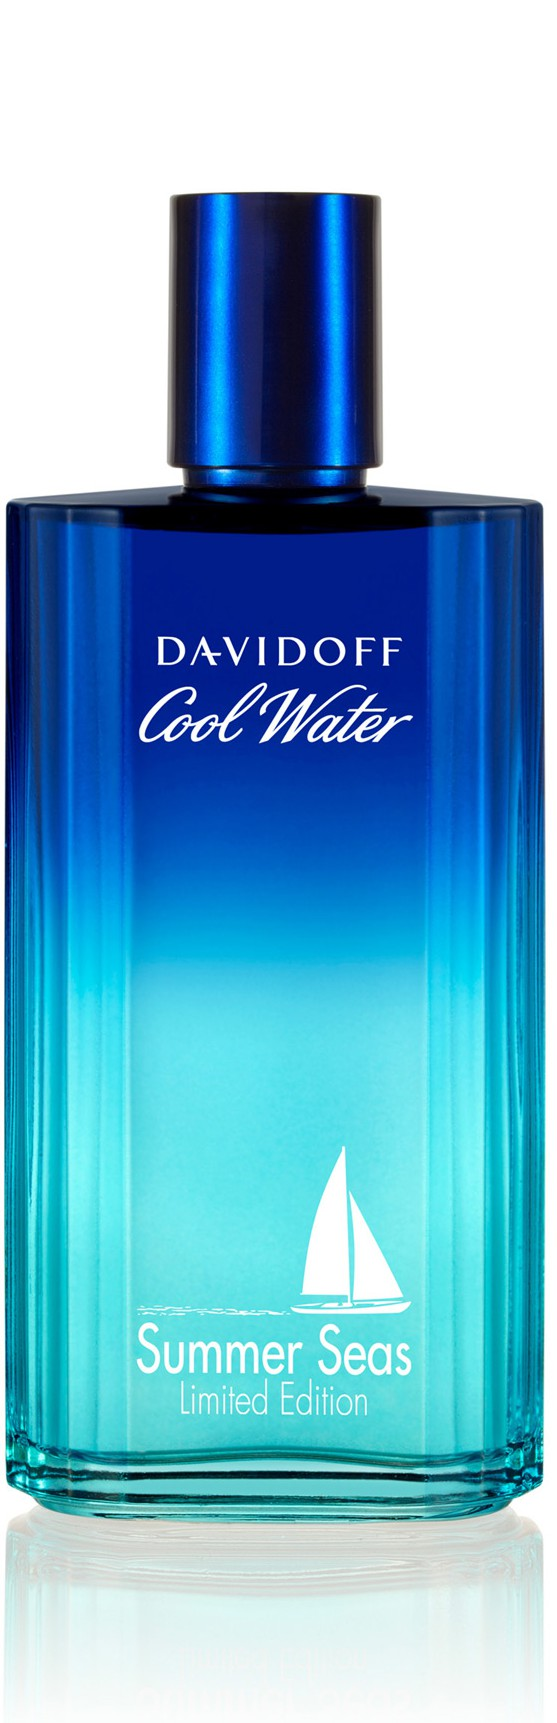 Davidoff Cool Water Man Summer Seas аромат для мужчин